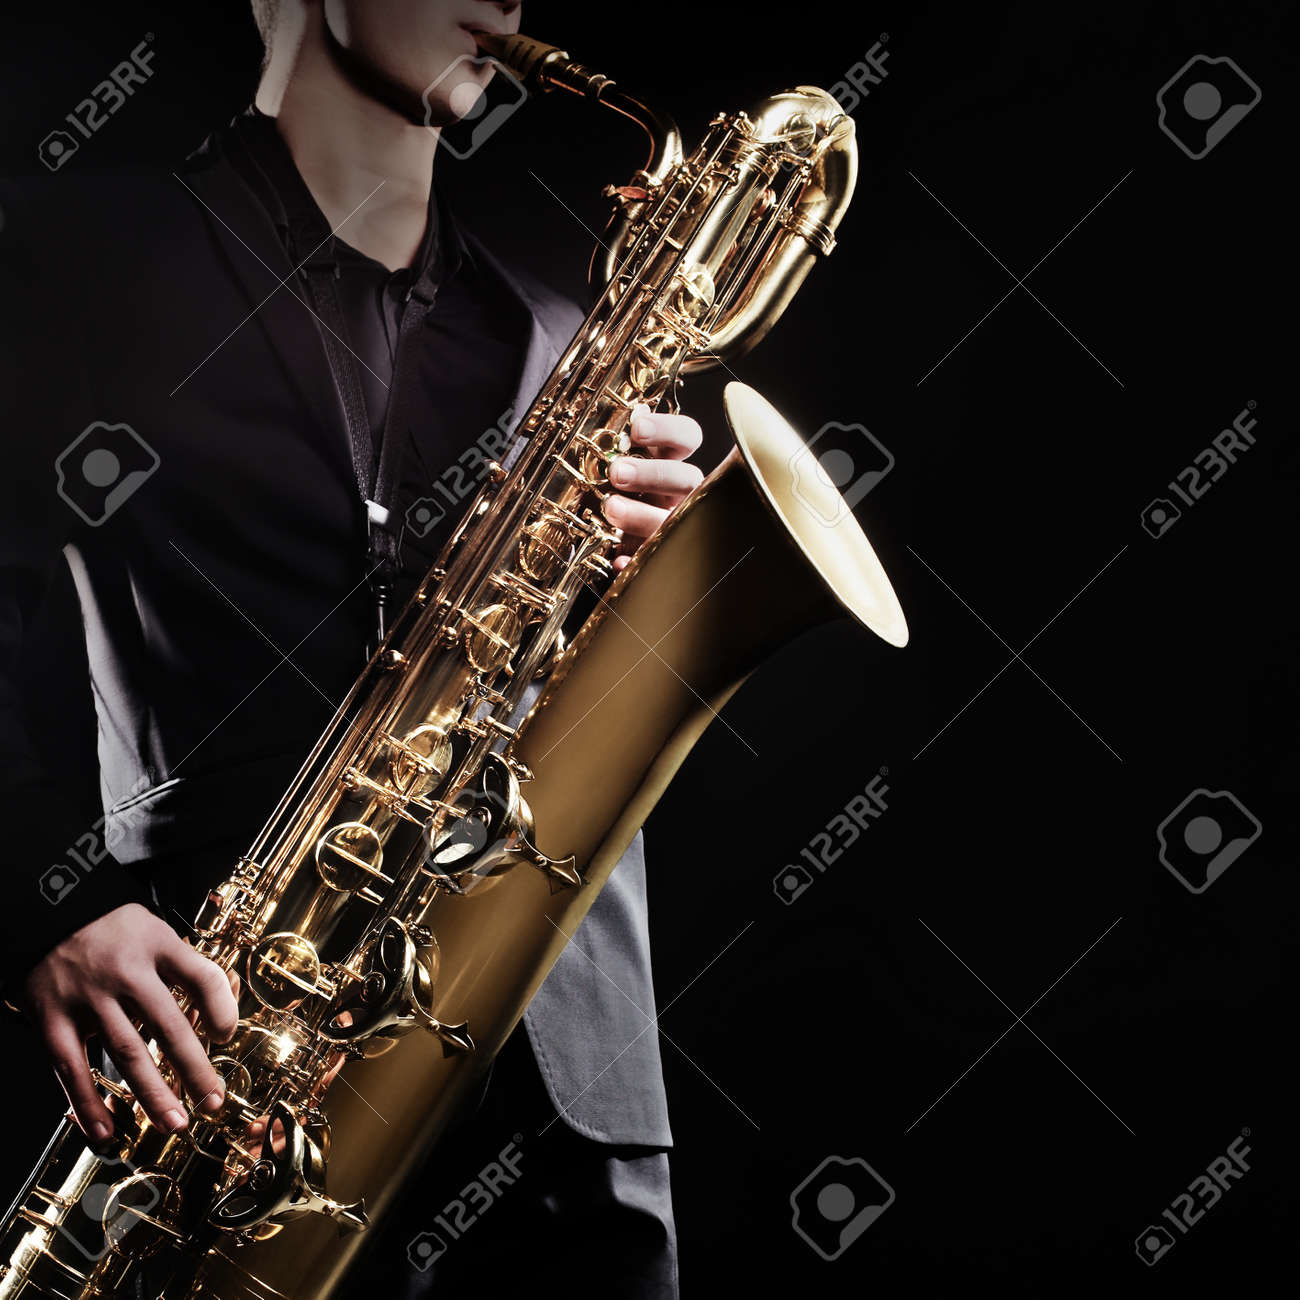 Saxophone baritone Saxophonist with sax jazz music instruments Standard-Bild - 38638624